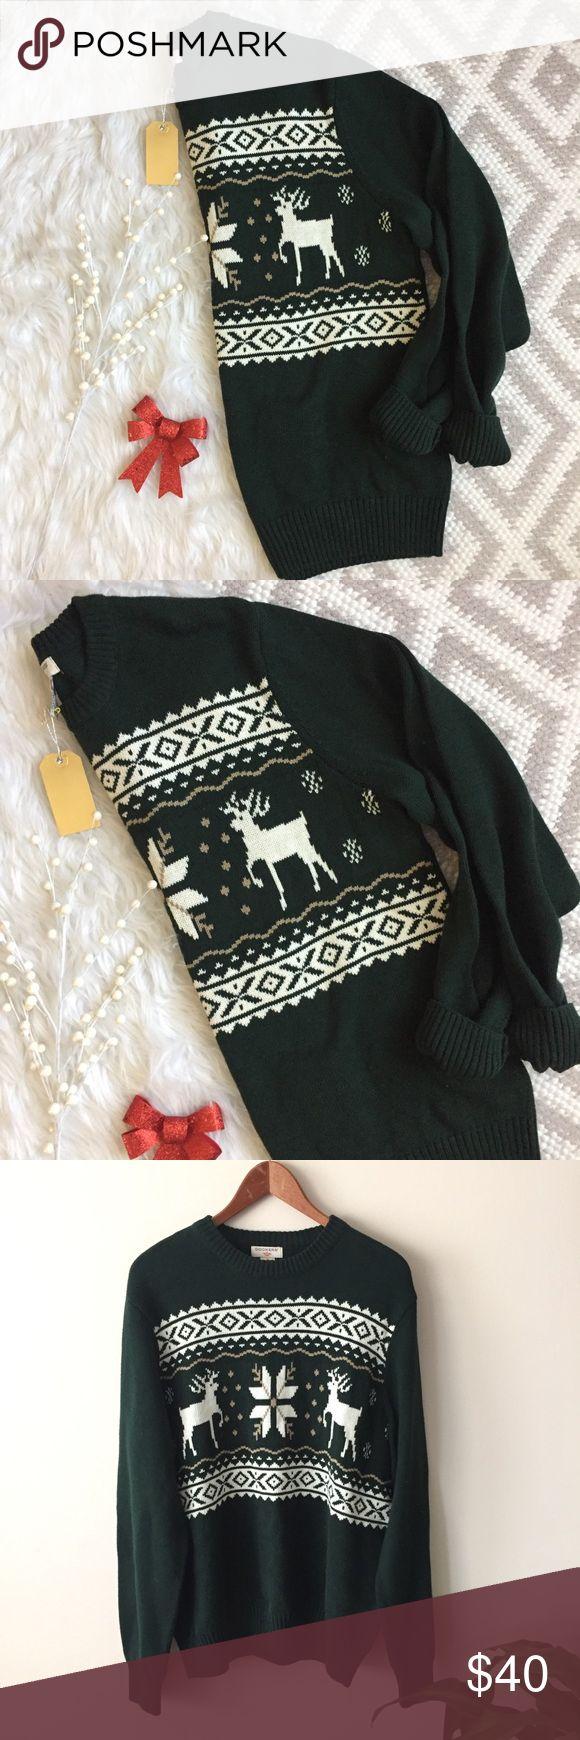 Dockers • Green Reindeer Sweater Docker's Hunter Green Reindeer Sweater   Oversized fit. Heavy/thick knit. 100% cotton. No flaws! Holiday season. Size L. Length: 26 in Bust: 22 in flat Dockers Sweaters